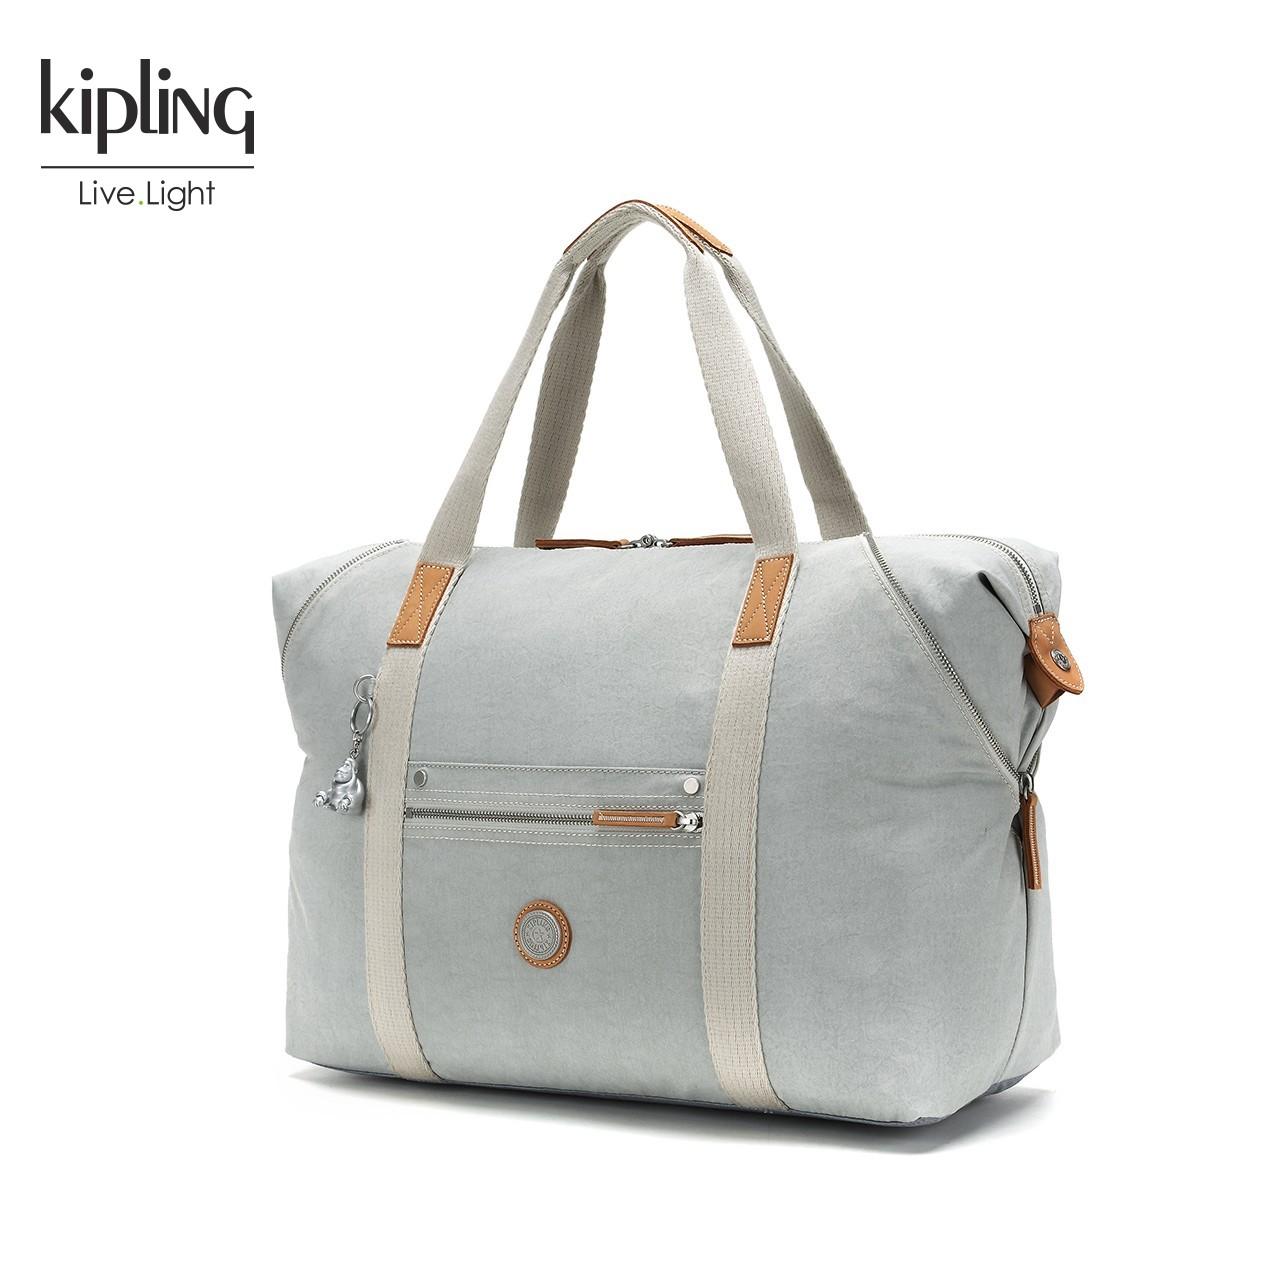 Kipling凯浦林包包女2018新款K20119背提包手拿包单肩包旅行袋